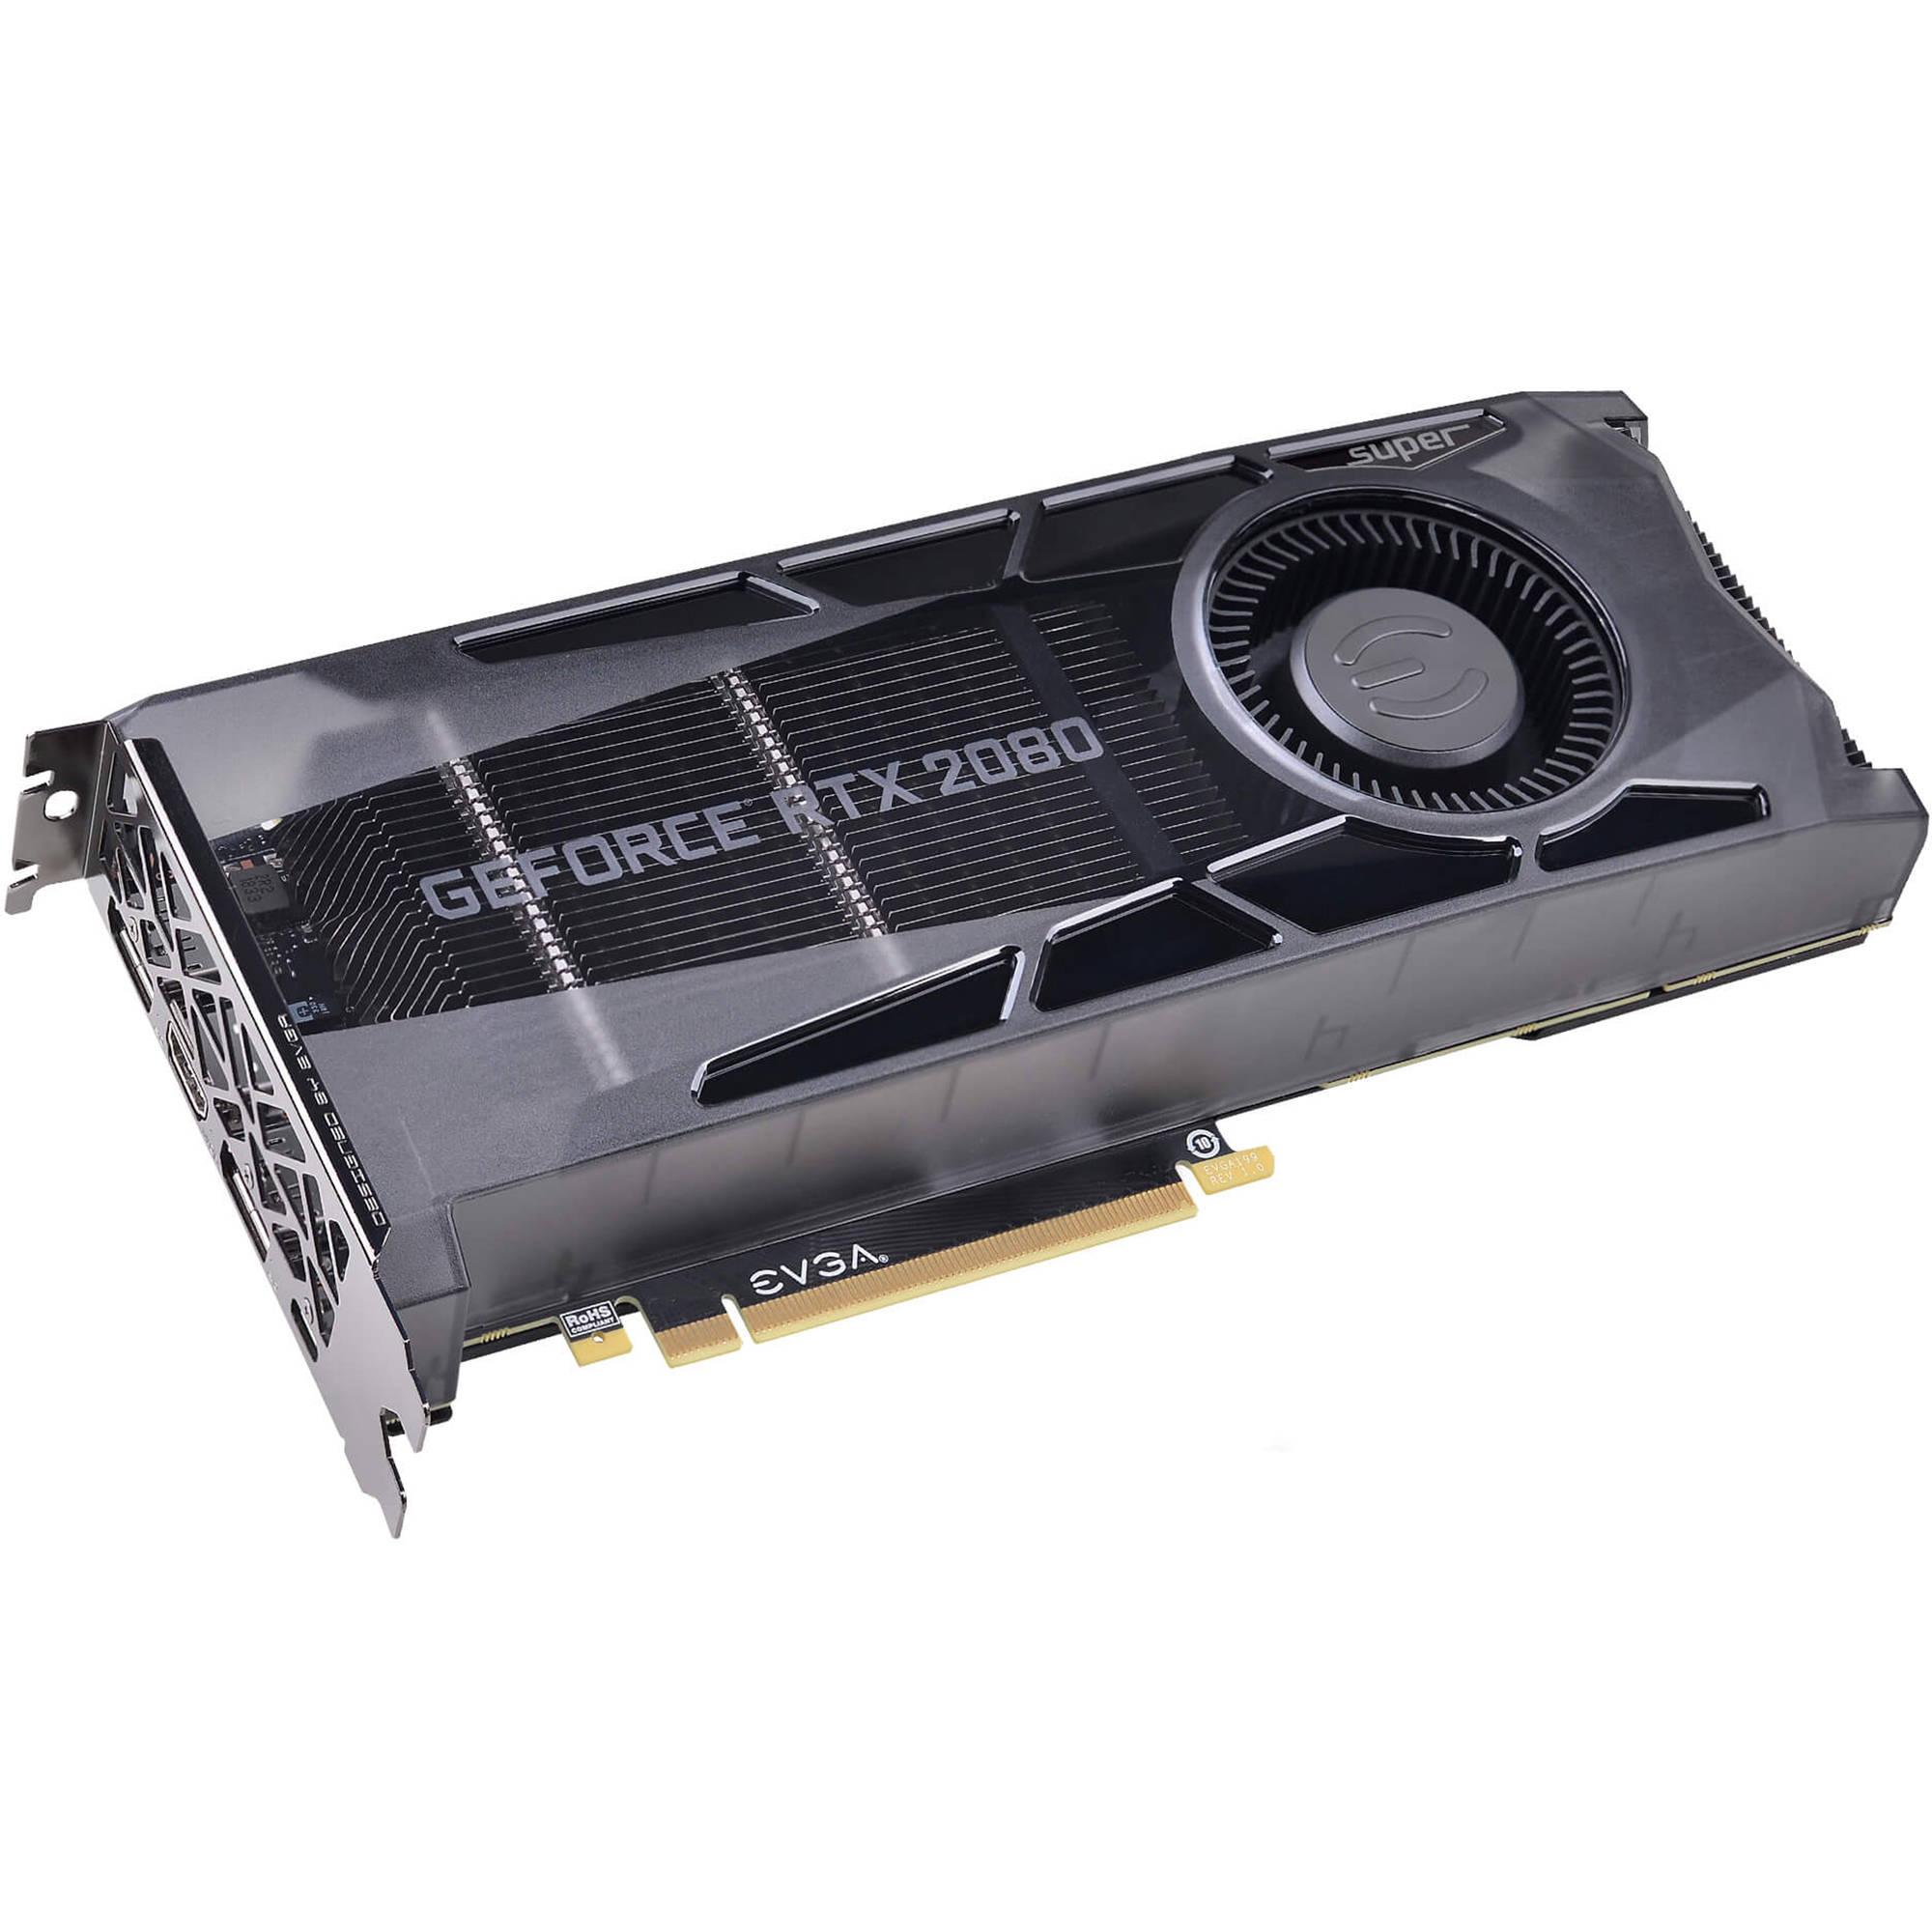 EVGA GeForce RTX 2080 SUPER FTW3 ULTRA GAMING Graphics Card